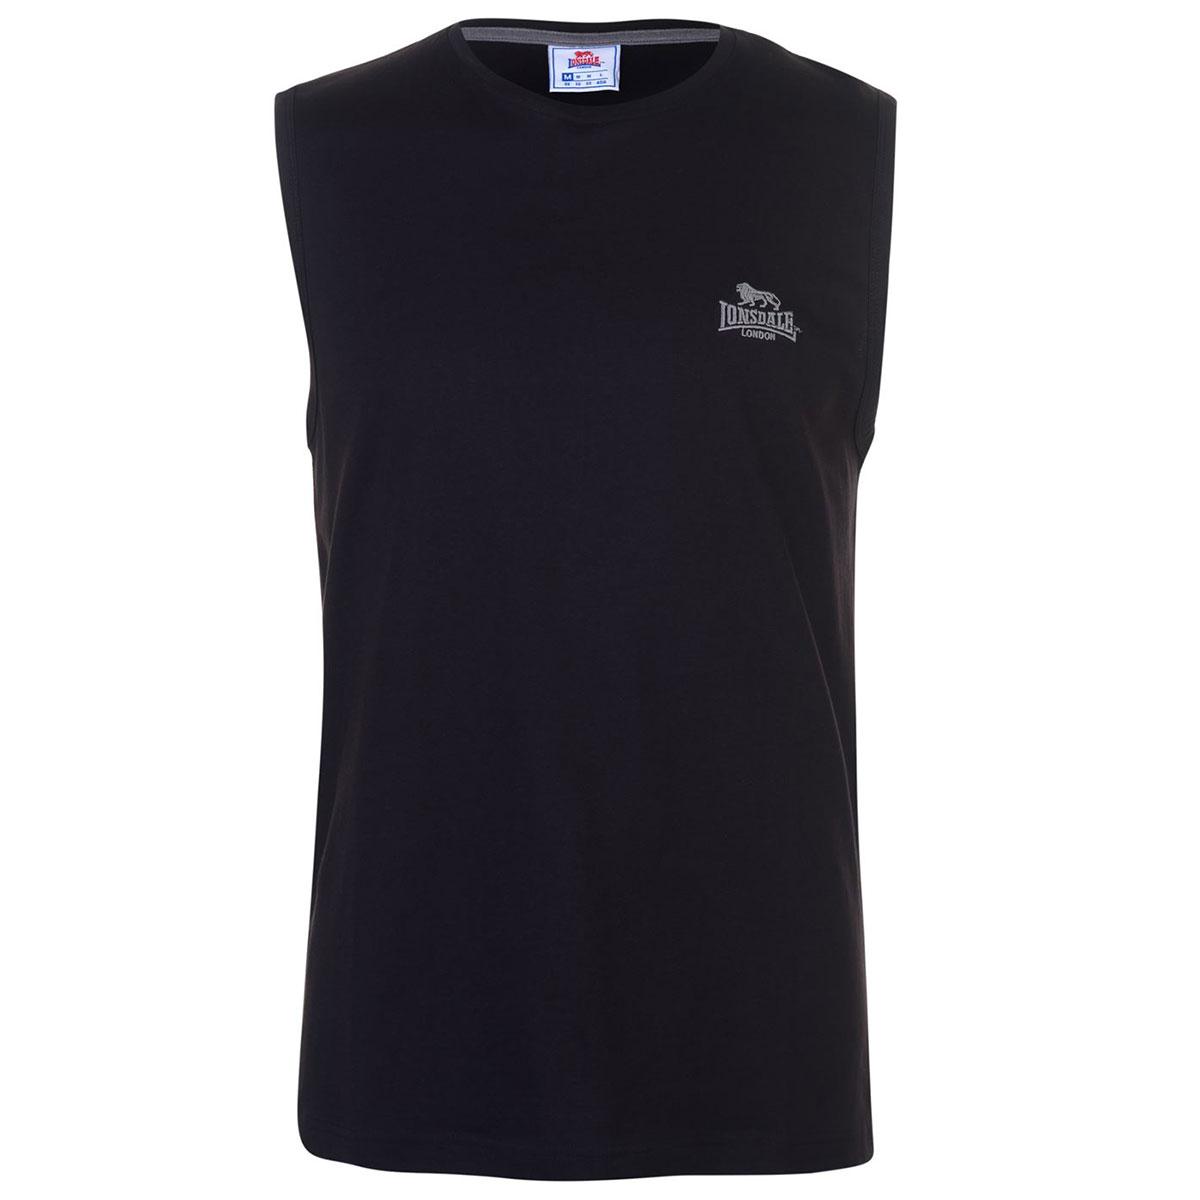 Lonsdale Men's Sleeveless Tee - Black, 4XL